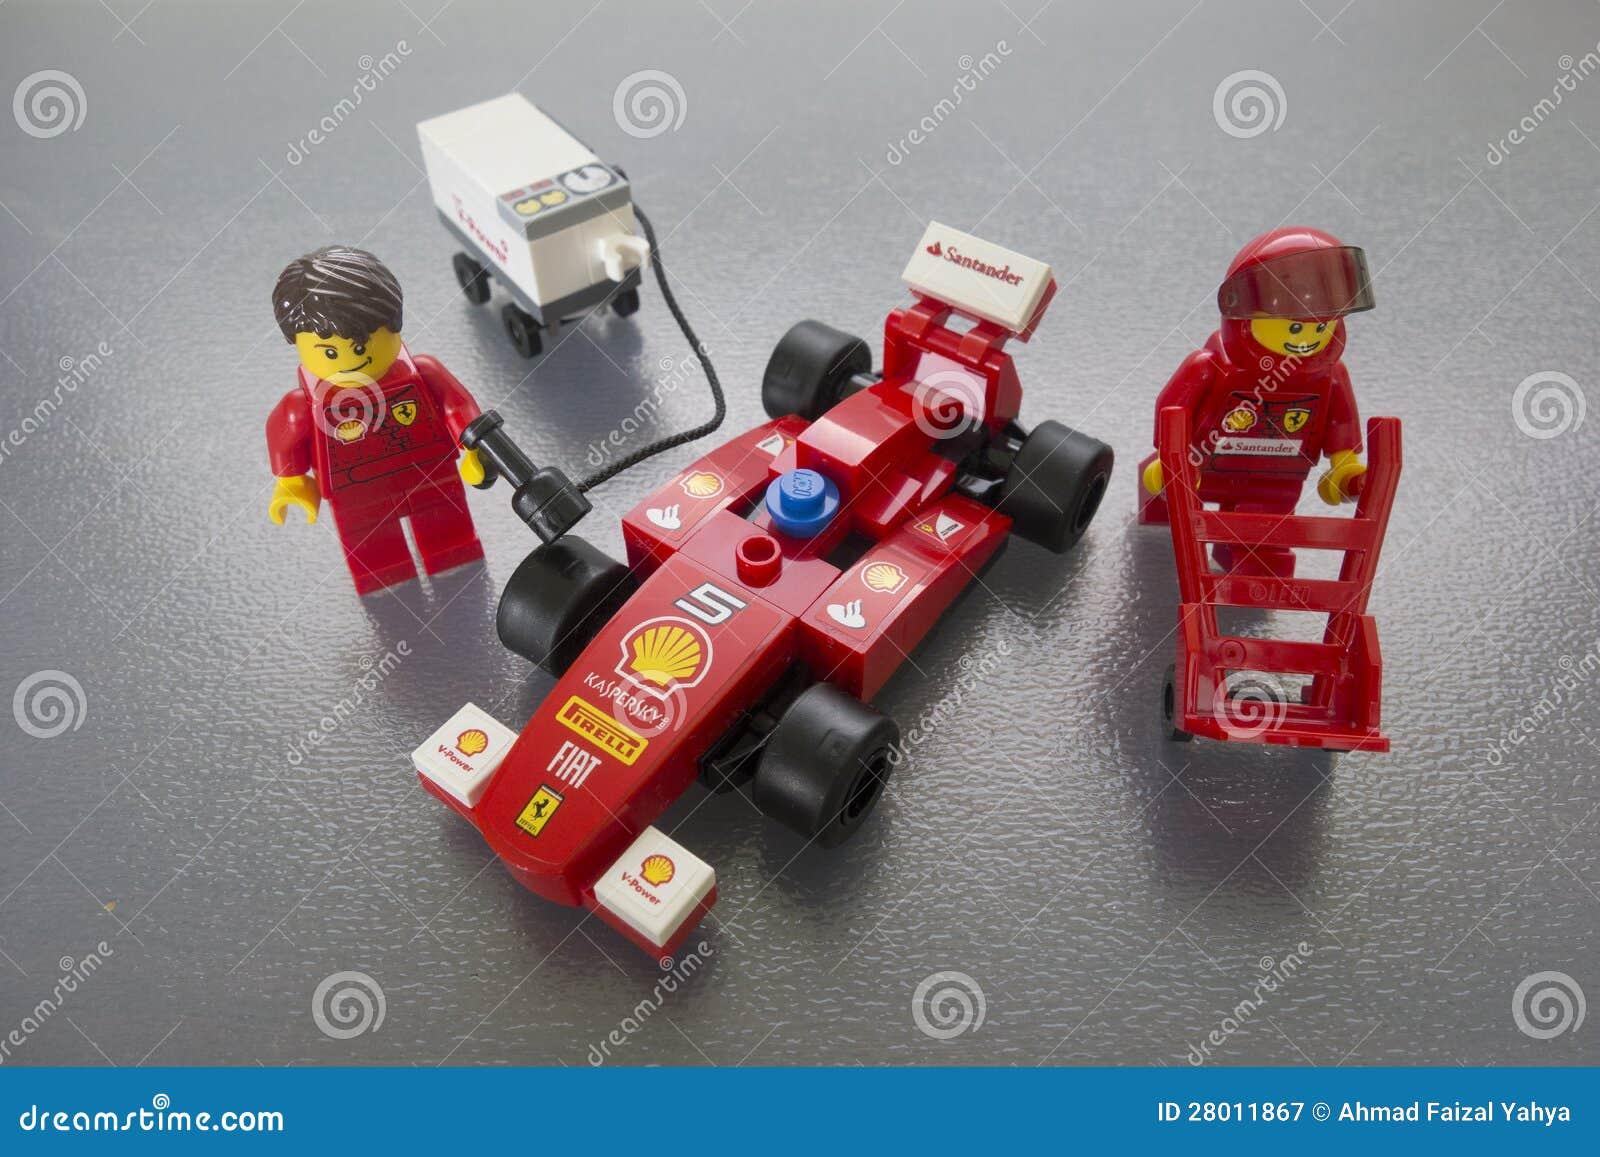 Shell Ferrari Lego toys editorial photography  Image of